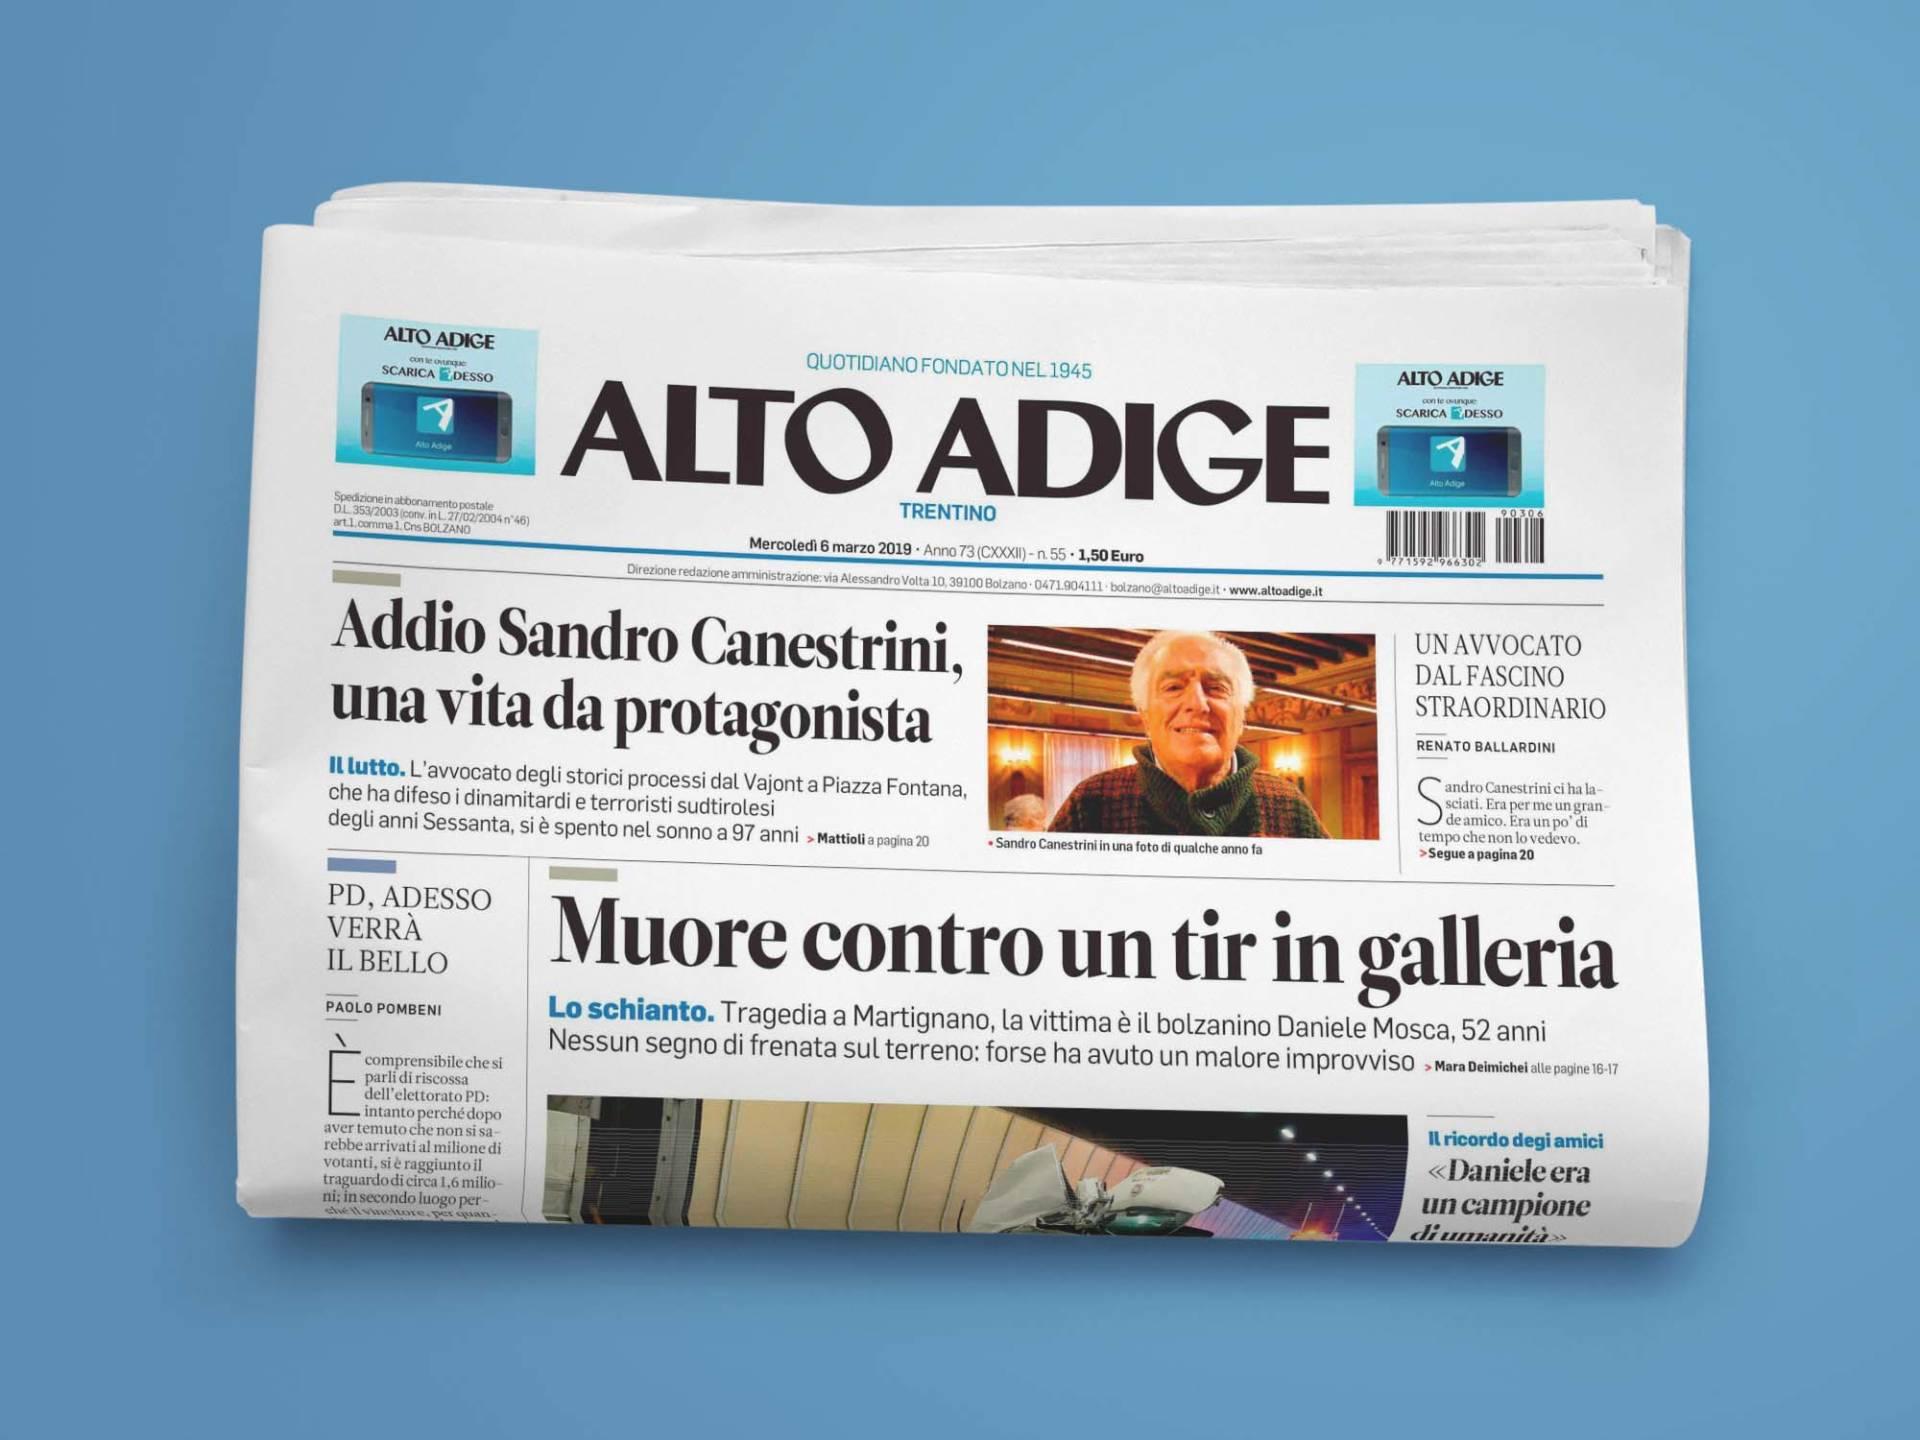 Alto_Adige_01_Wenceslau_News_Design